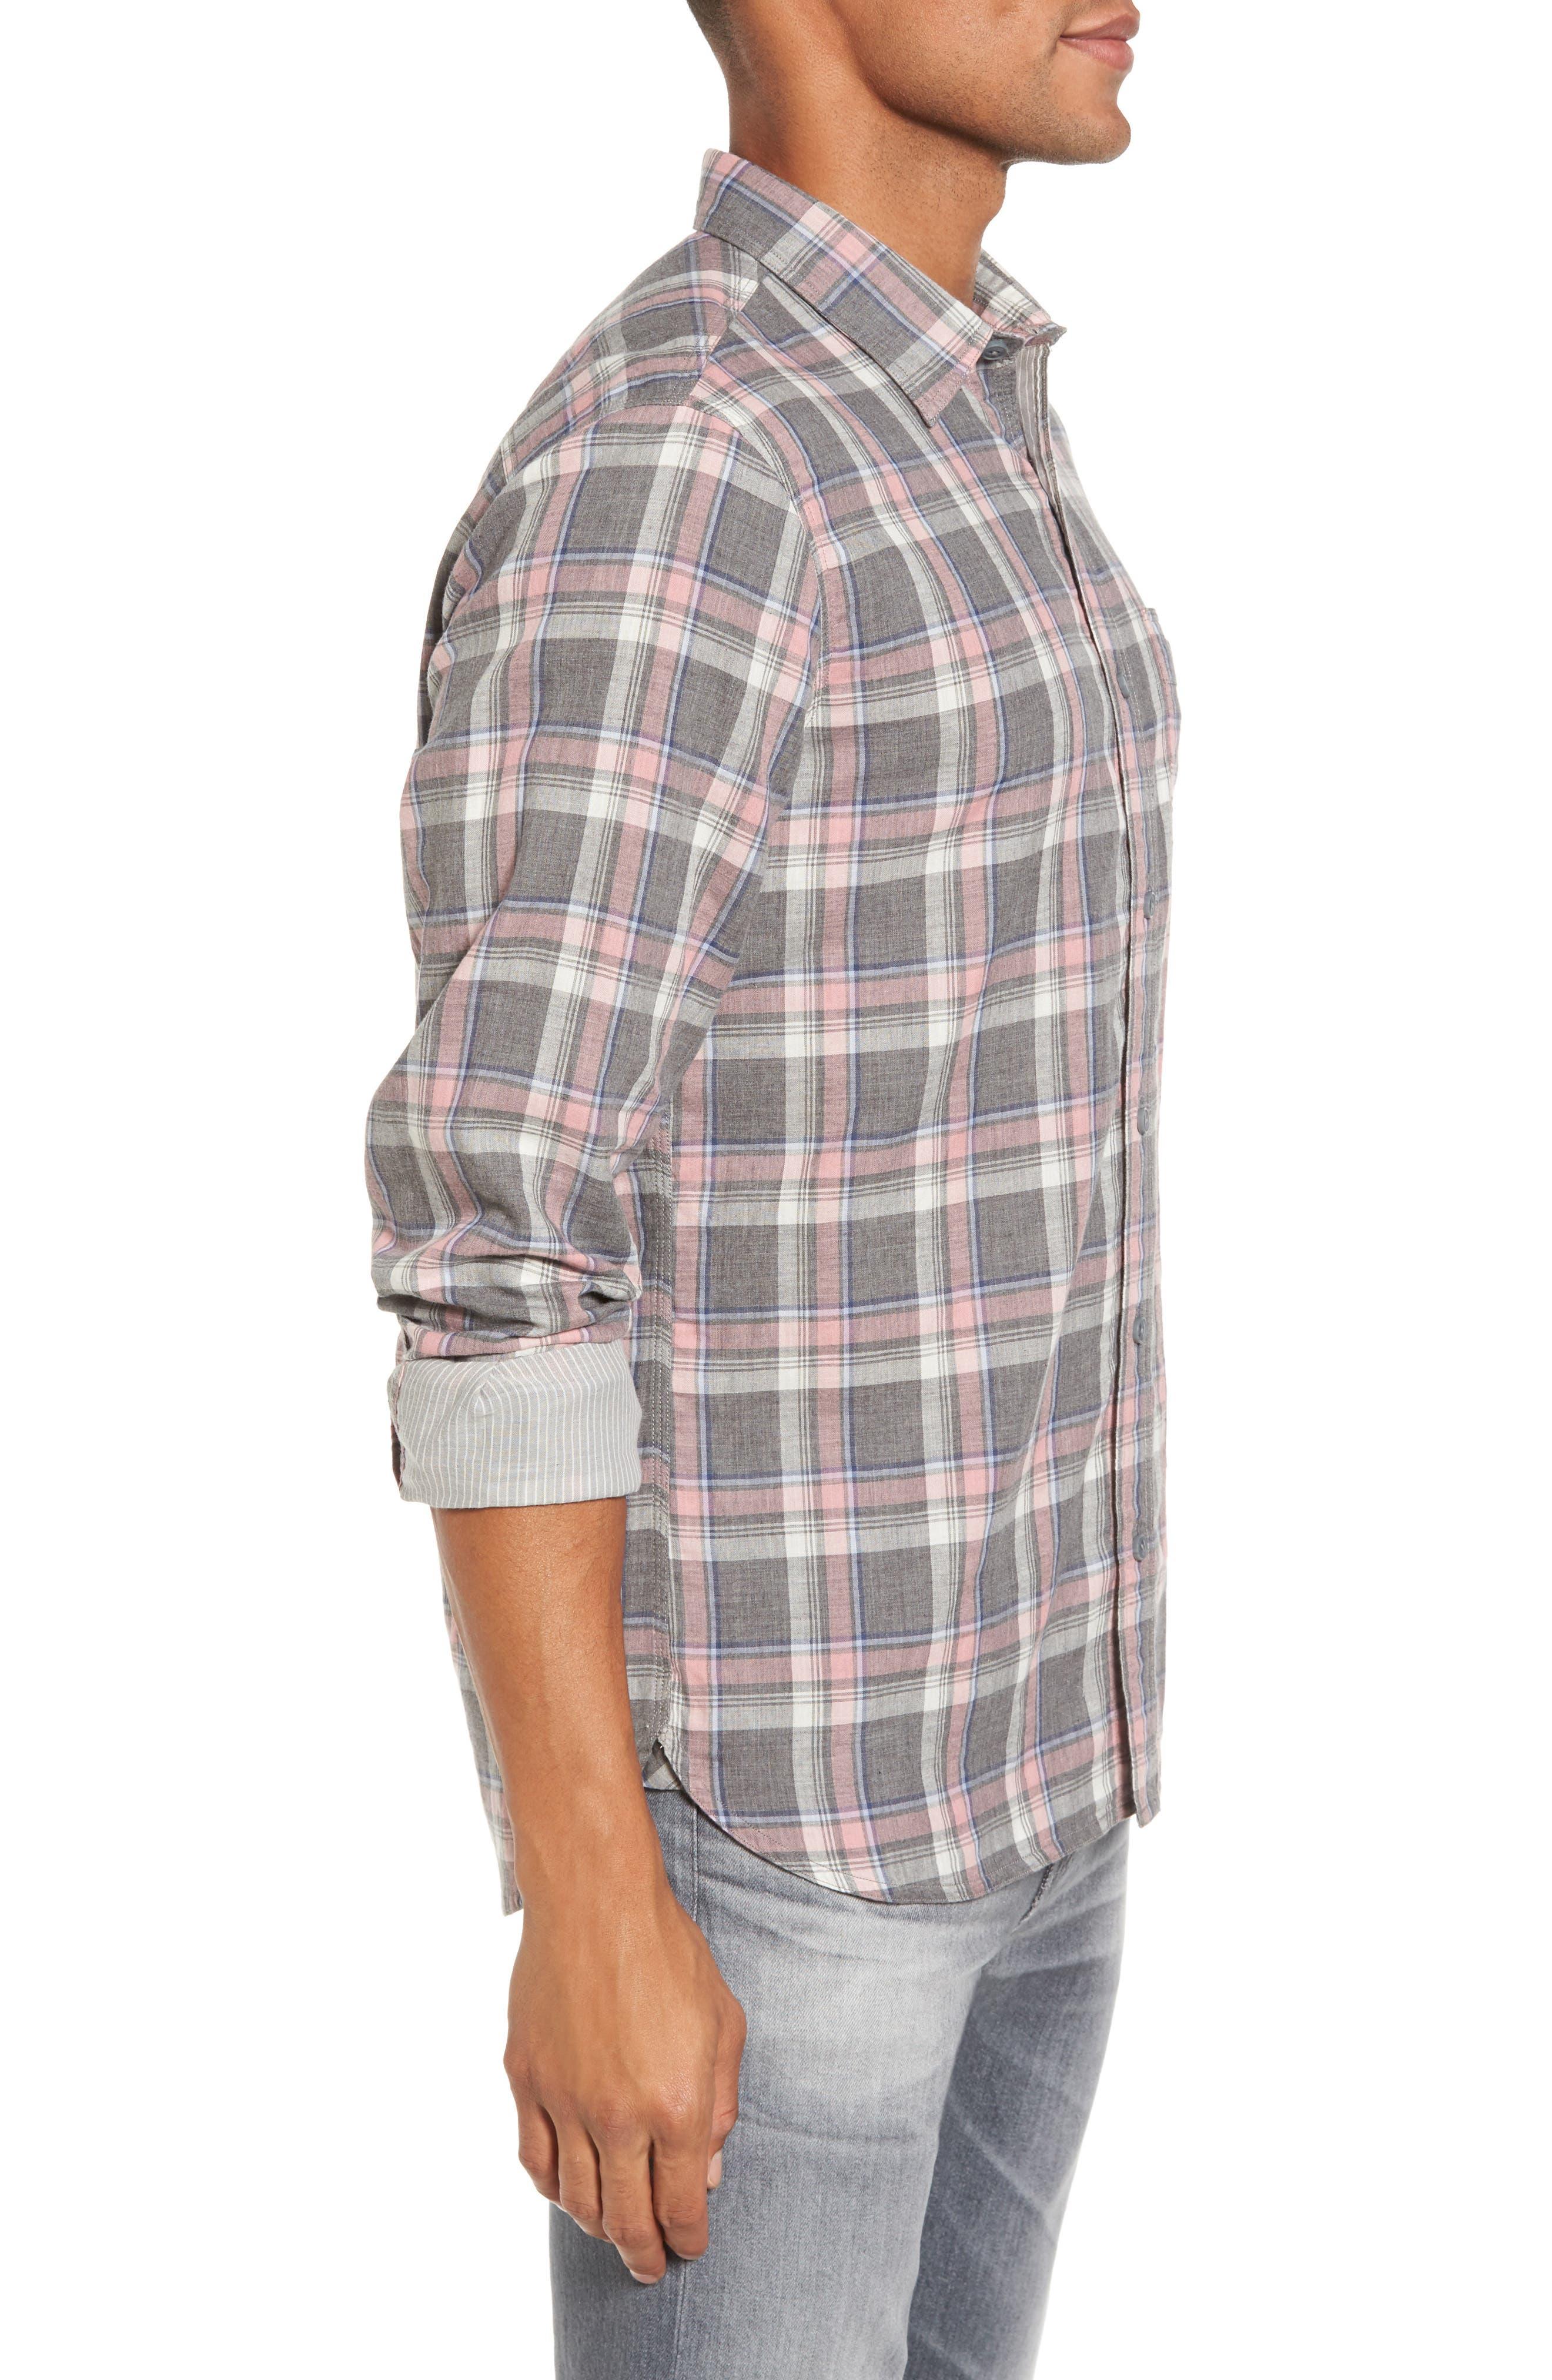 Trim Fit Utility Duofold Sport Shirt,                             Alternate thumbnail 3, color,                             Grey Paloma Pink Plaid Duofold